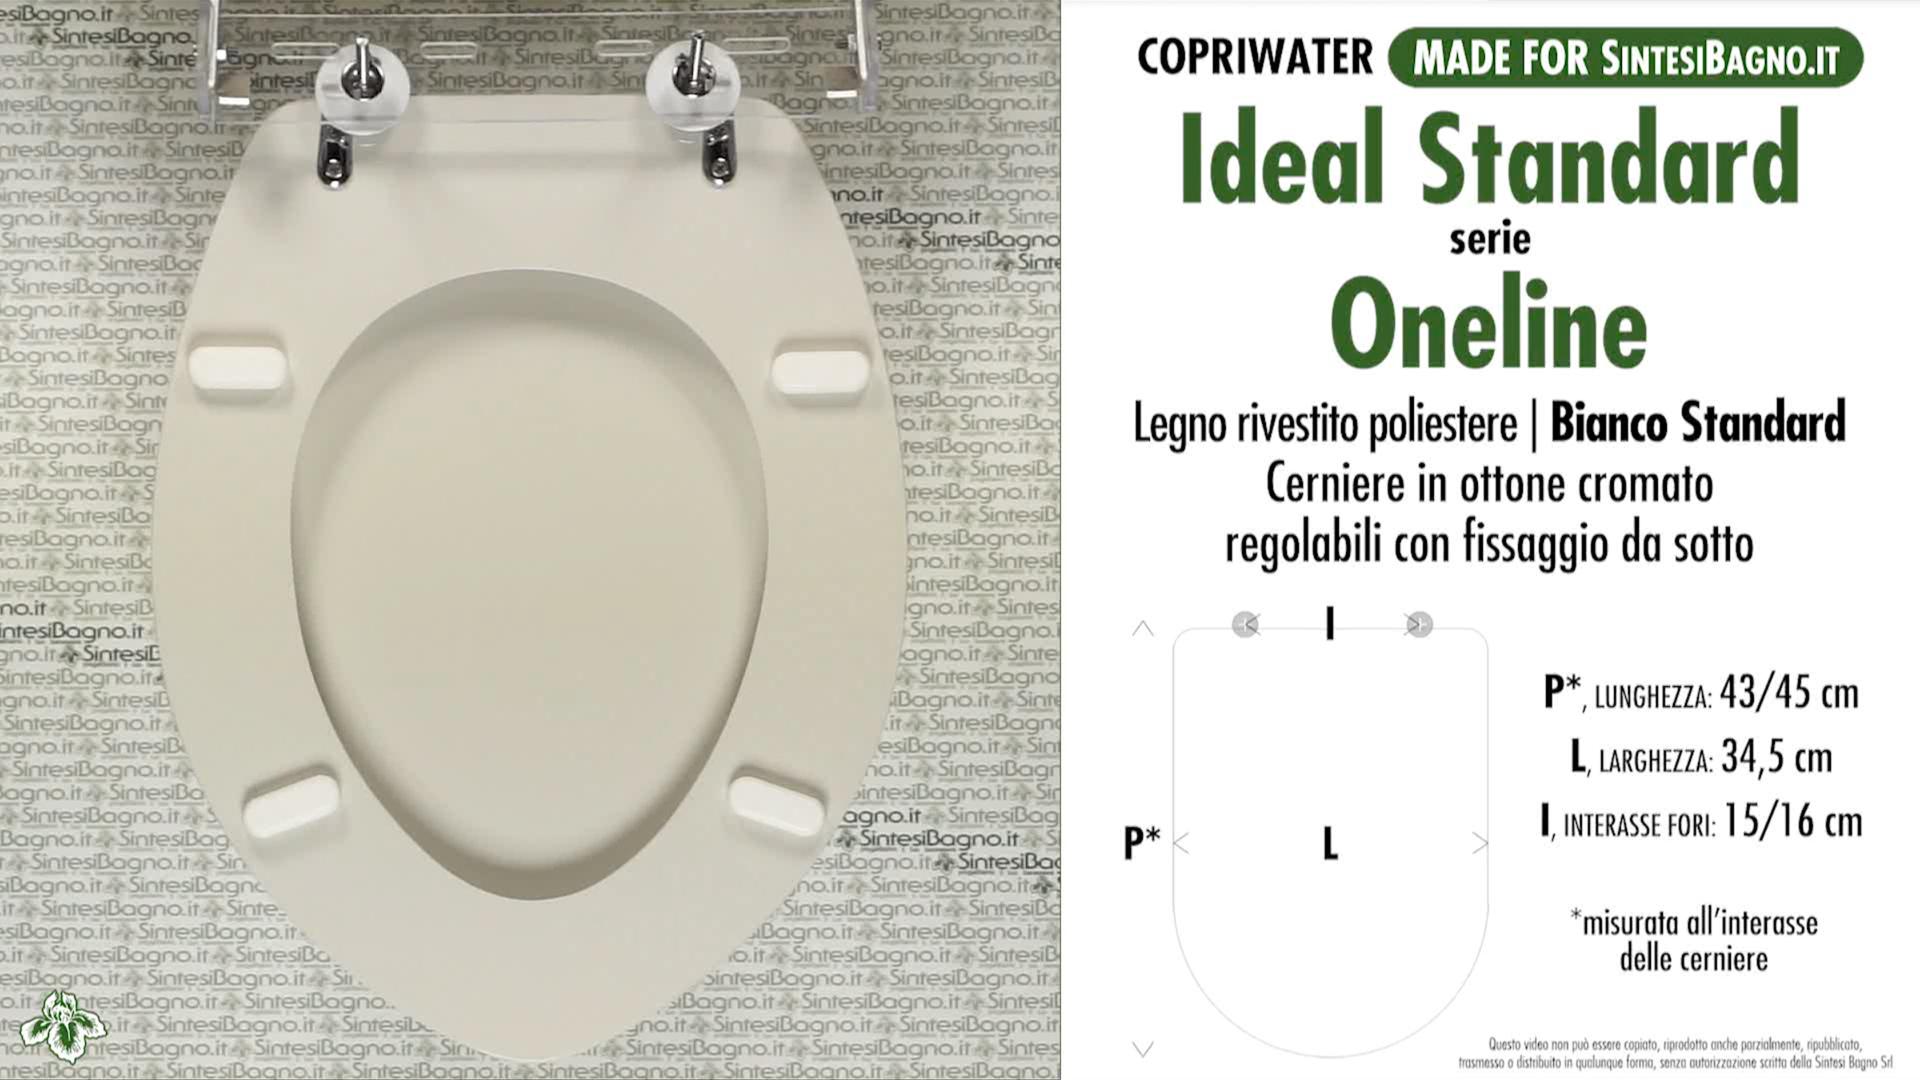 SCHEDA TECNICA MISURE copriwater IDEAL STANDARD ONELINE